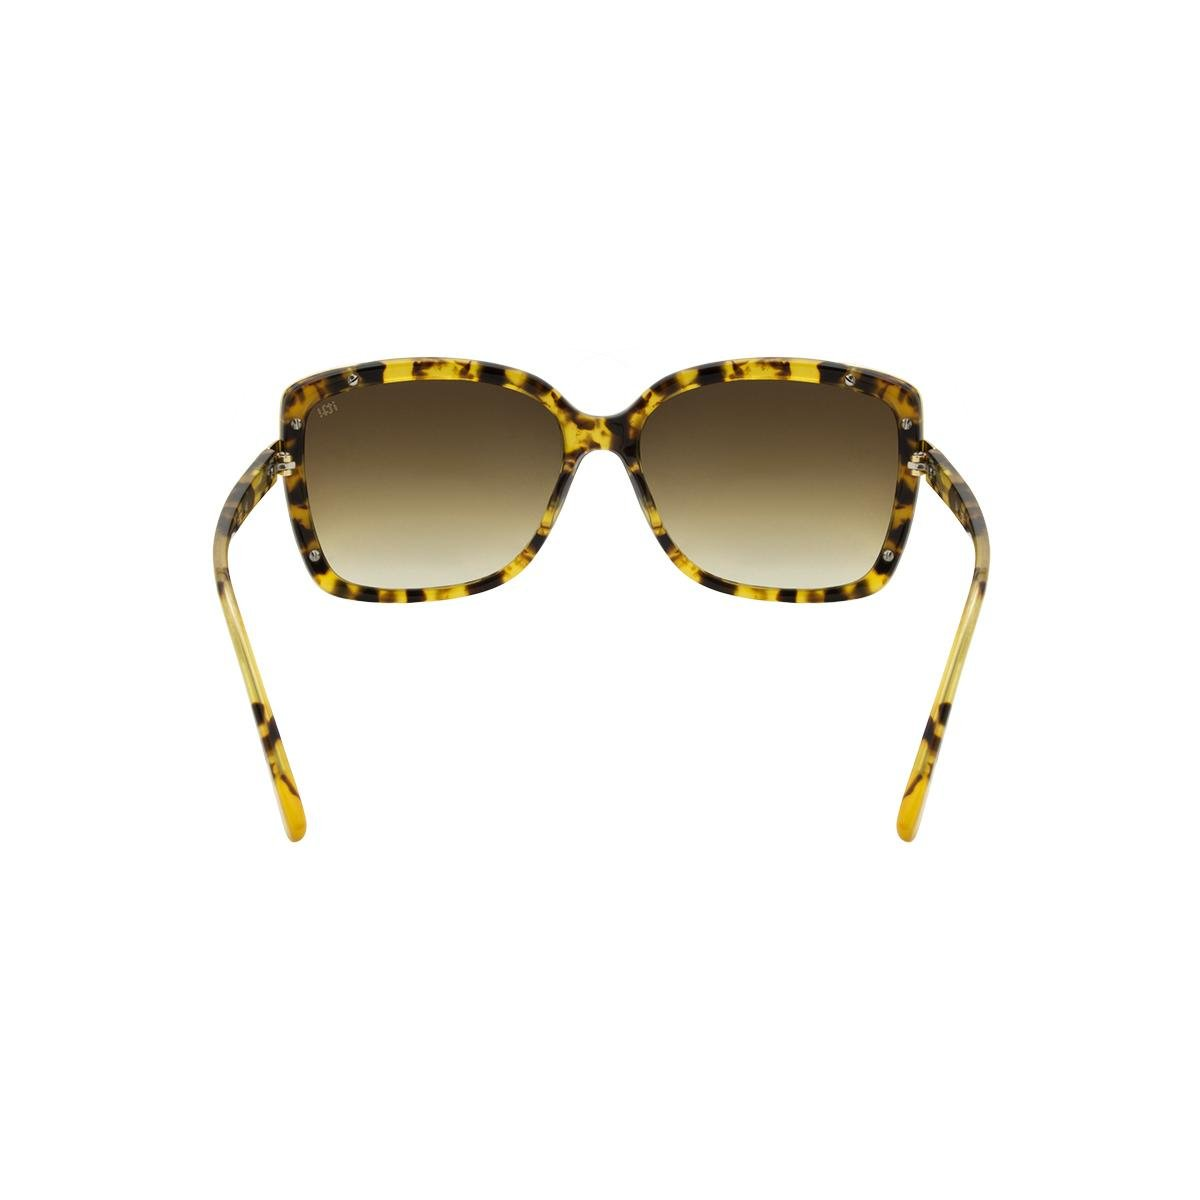 Óculos De Sol It Eyewear Princess A115 Feminino - Compre Agora   Zattini 1e6ae84ecb